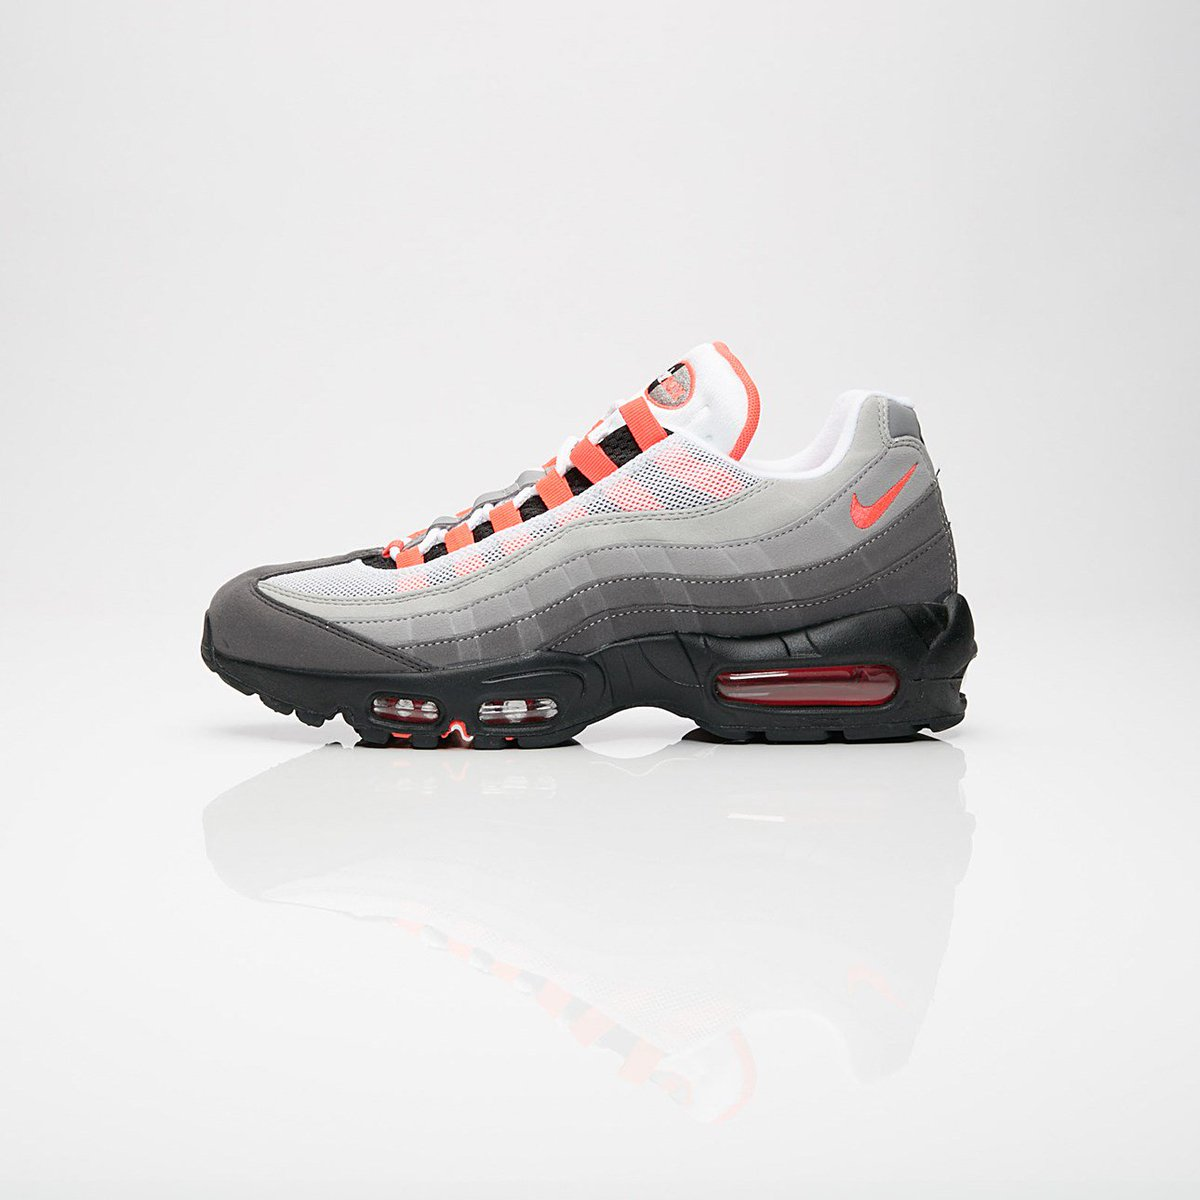 ... factory price 571e9 aade5 ... cute cheap The Nike Air Max 95 OG Solar  ... cd7391d0565e